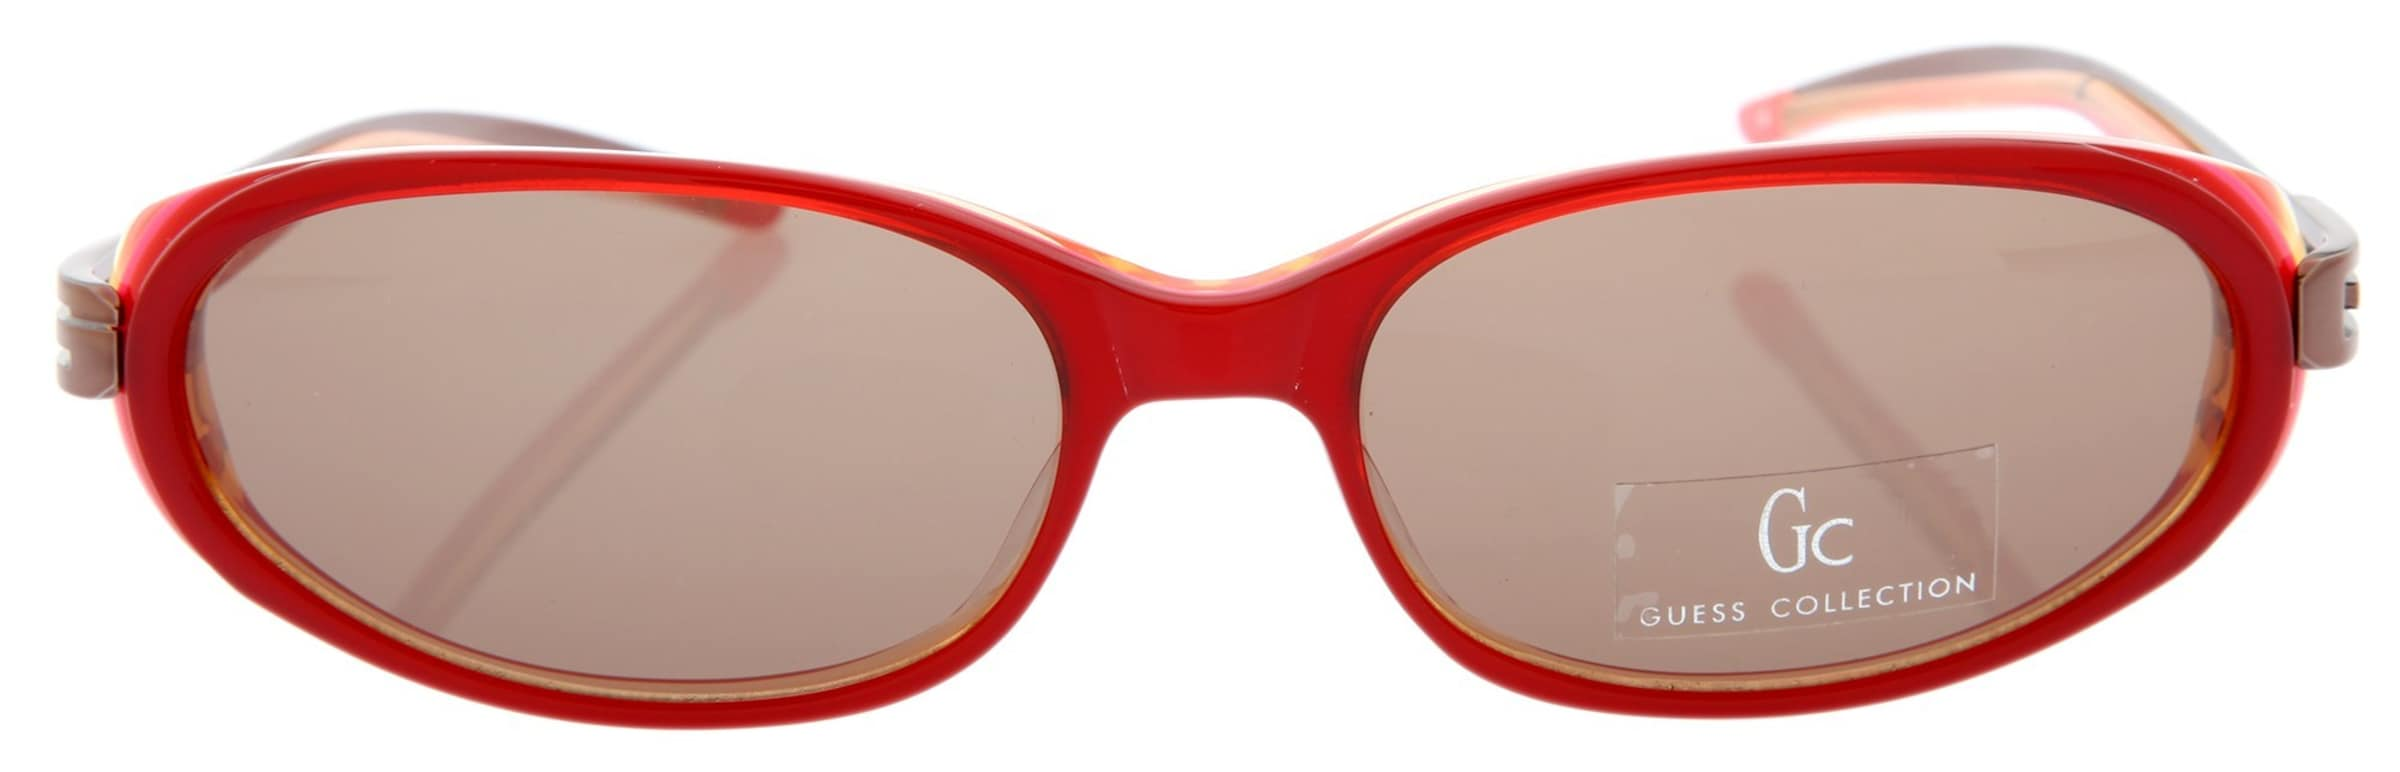 GUESS Sonnenbrille GU5135-RB-1 Günstig Kaufen Outlet LFD04